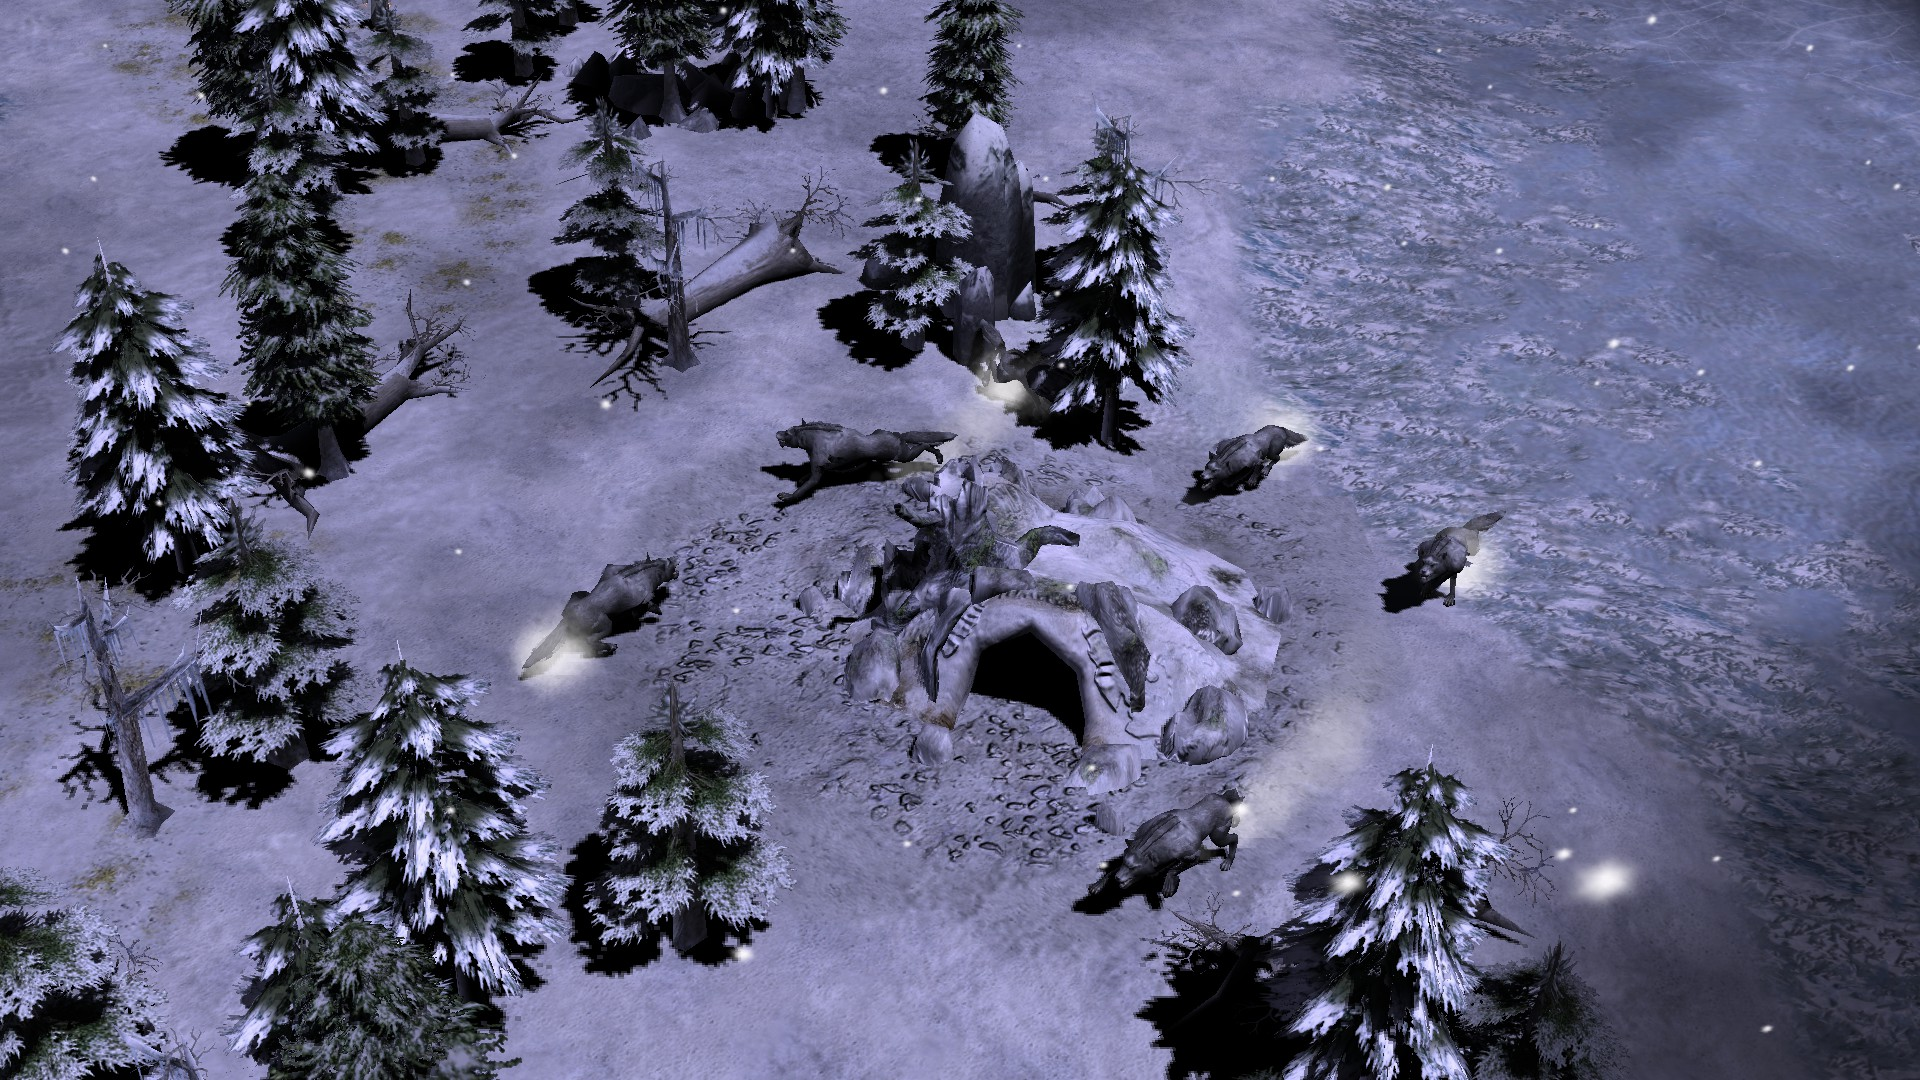 frostwolves